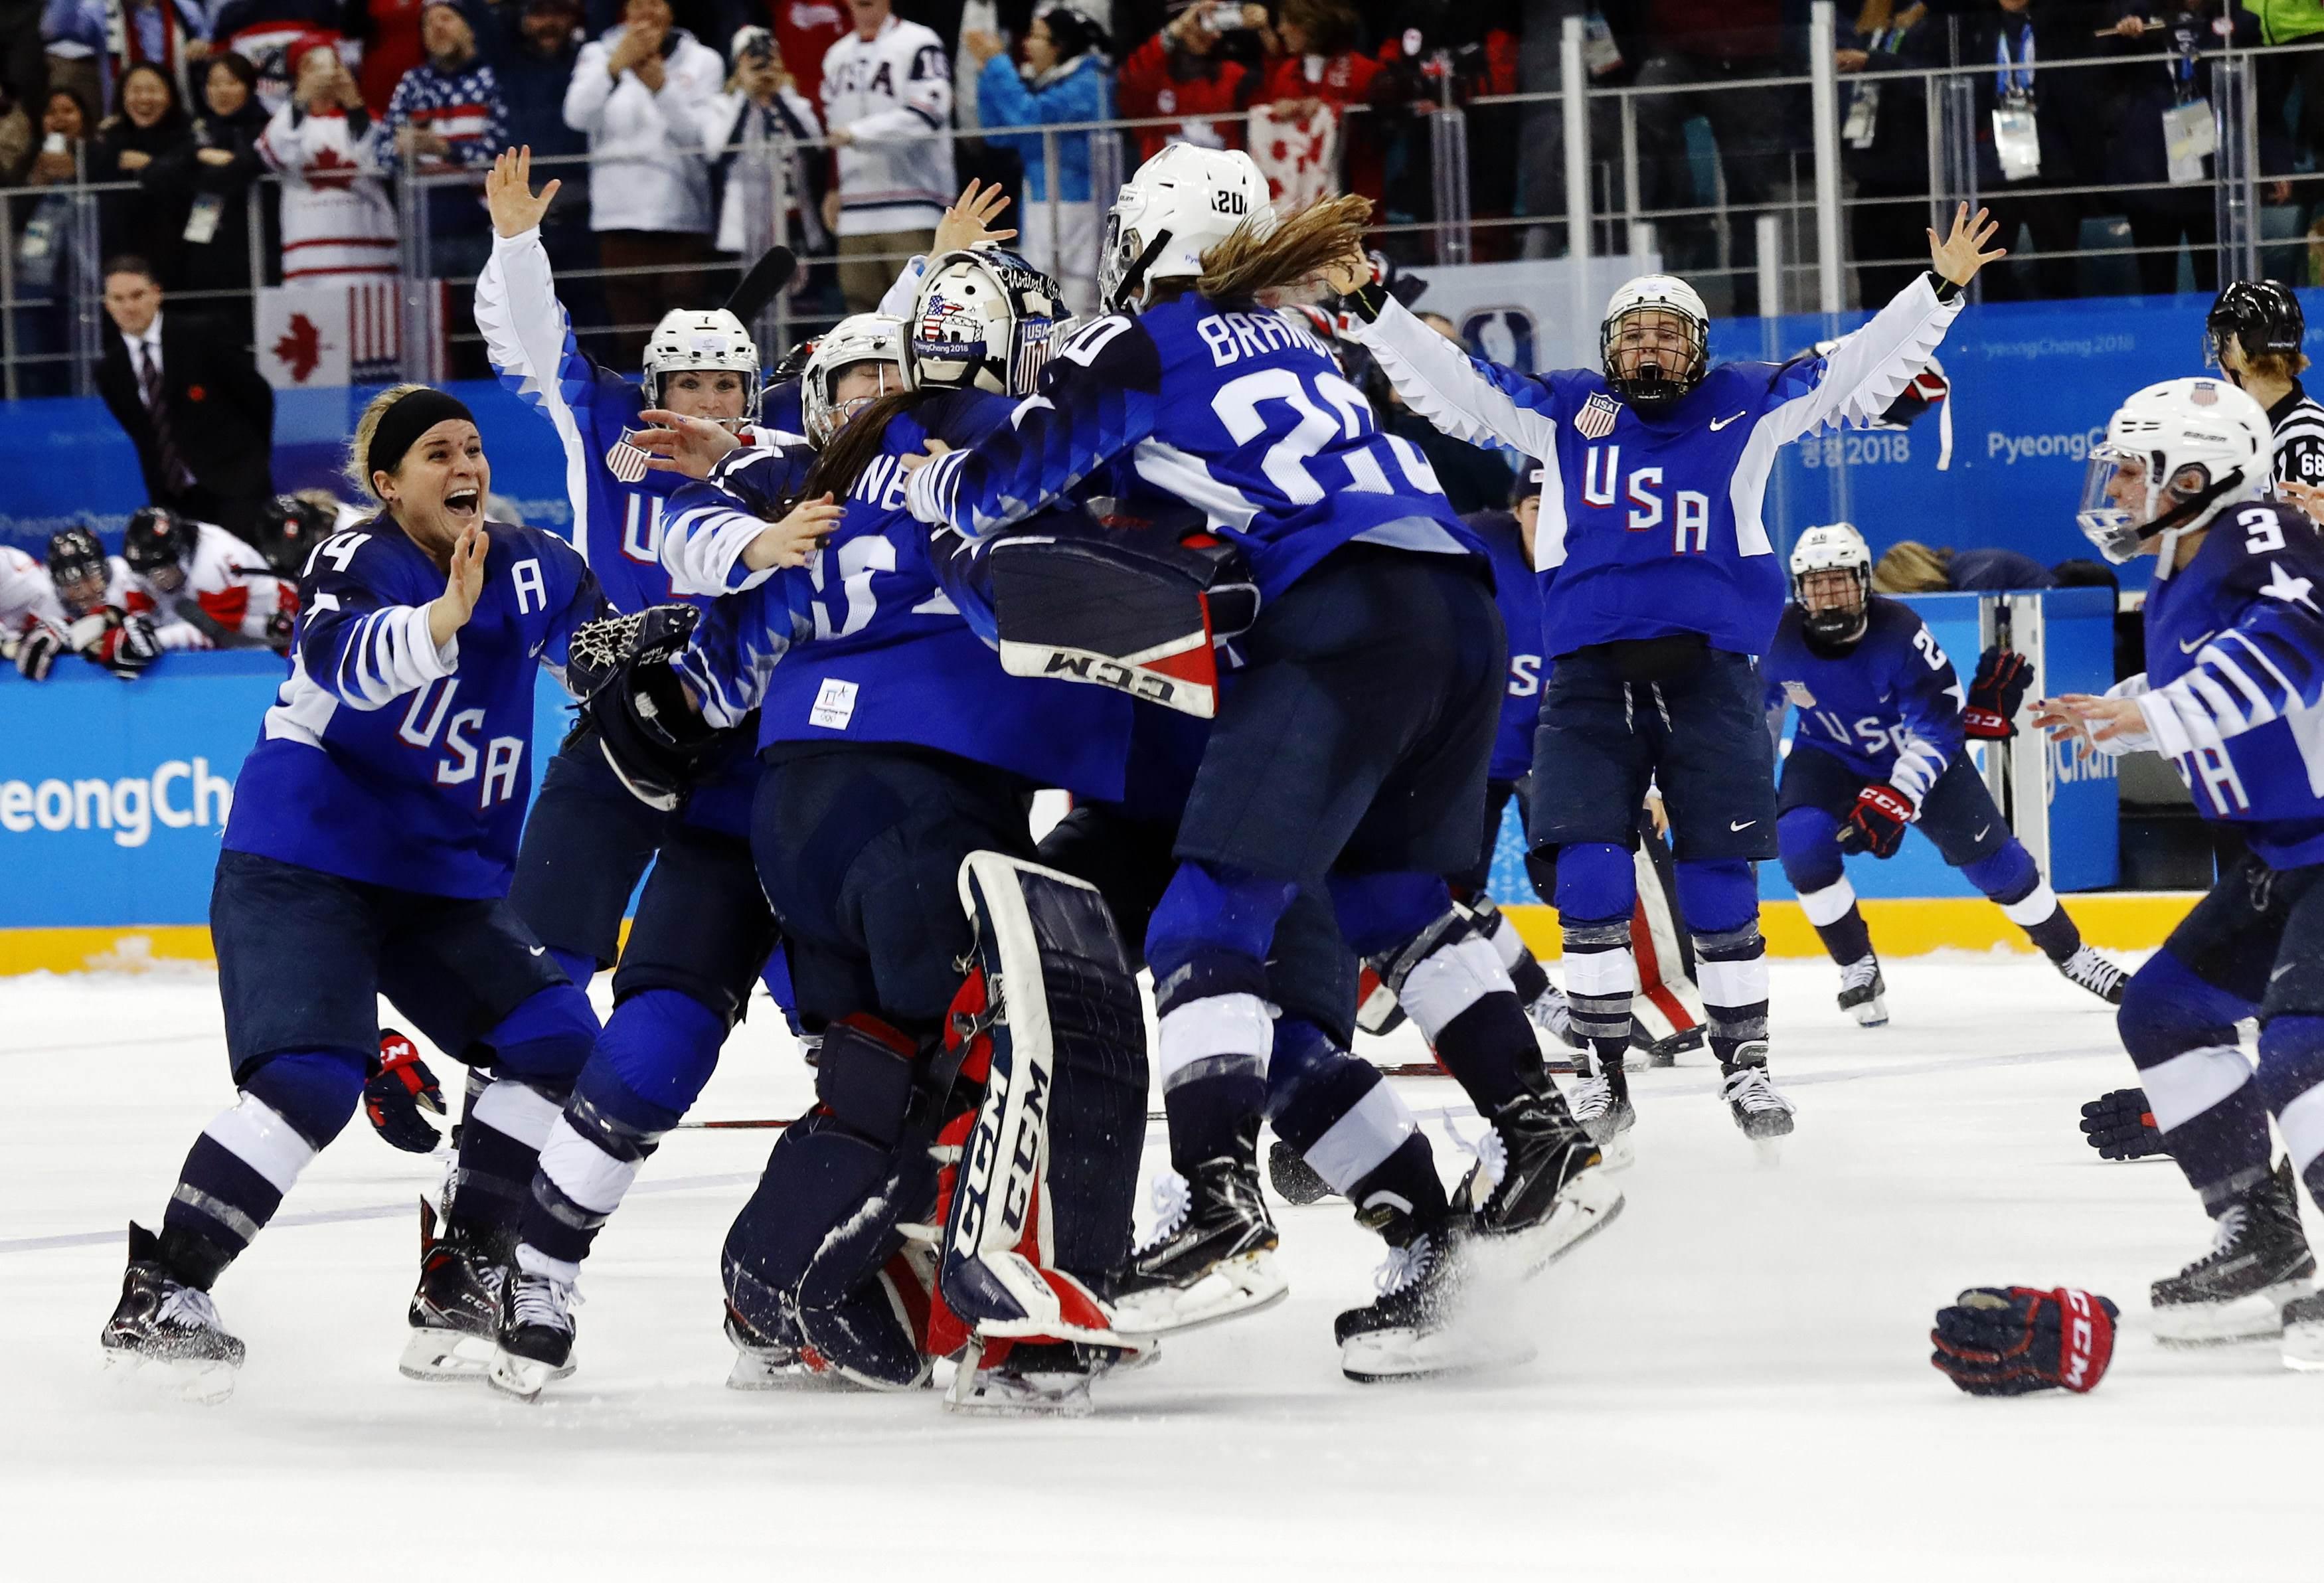 merikaanse ijshockeysters dolblij na winst olympisch goud